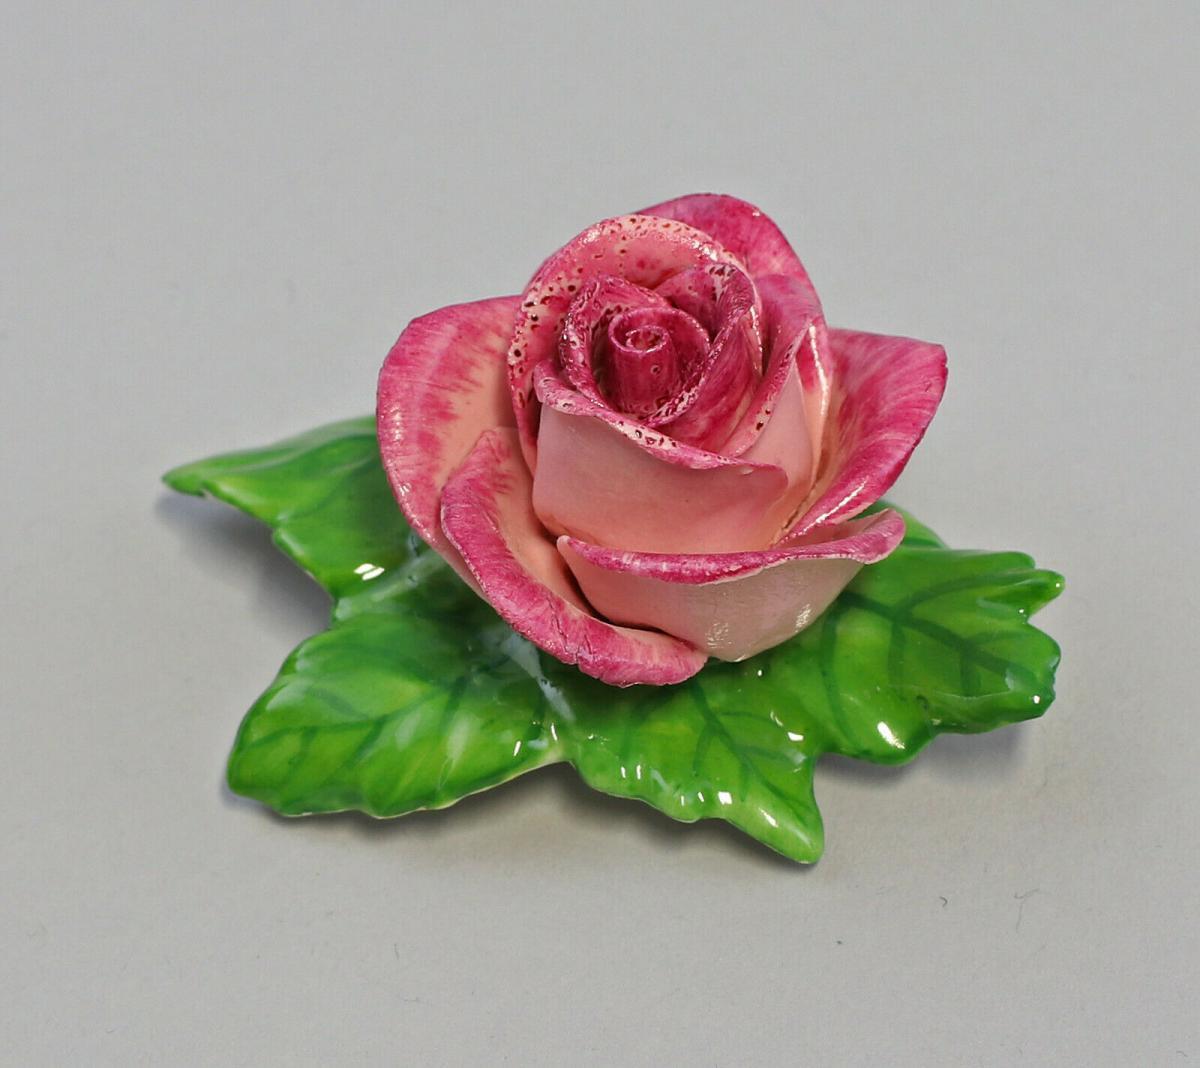 9959619 Porzellan Figur Tischblume Rose purpur rosa Ens 7x5x3cm